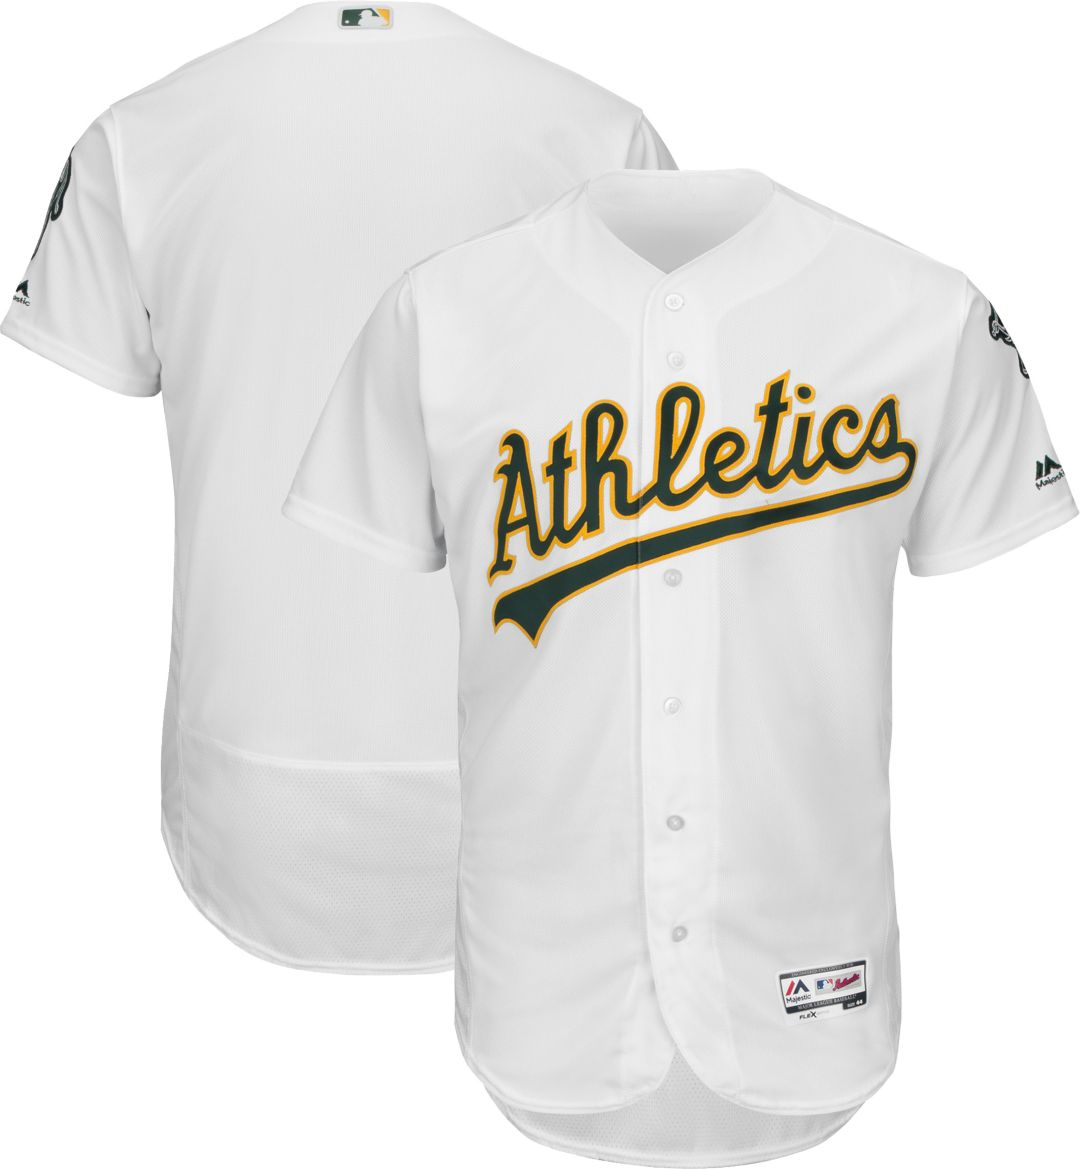 856702911 Majestic Men's Authentic Oakland Athletics Home White Flex Base On-Field  Jersey